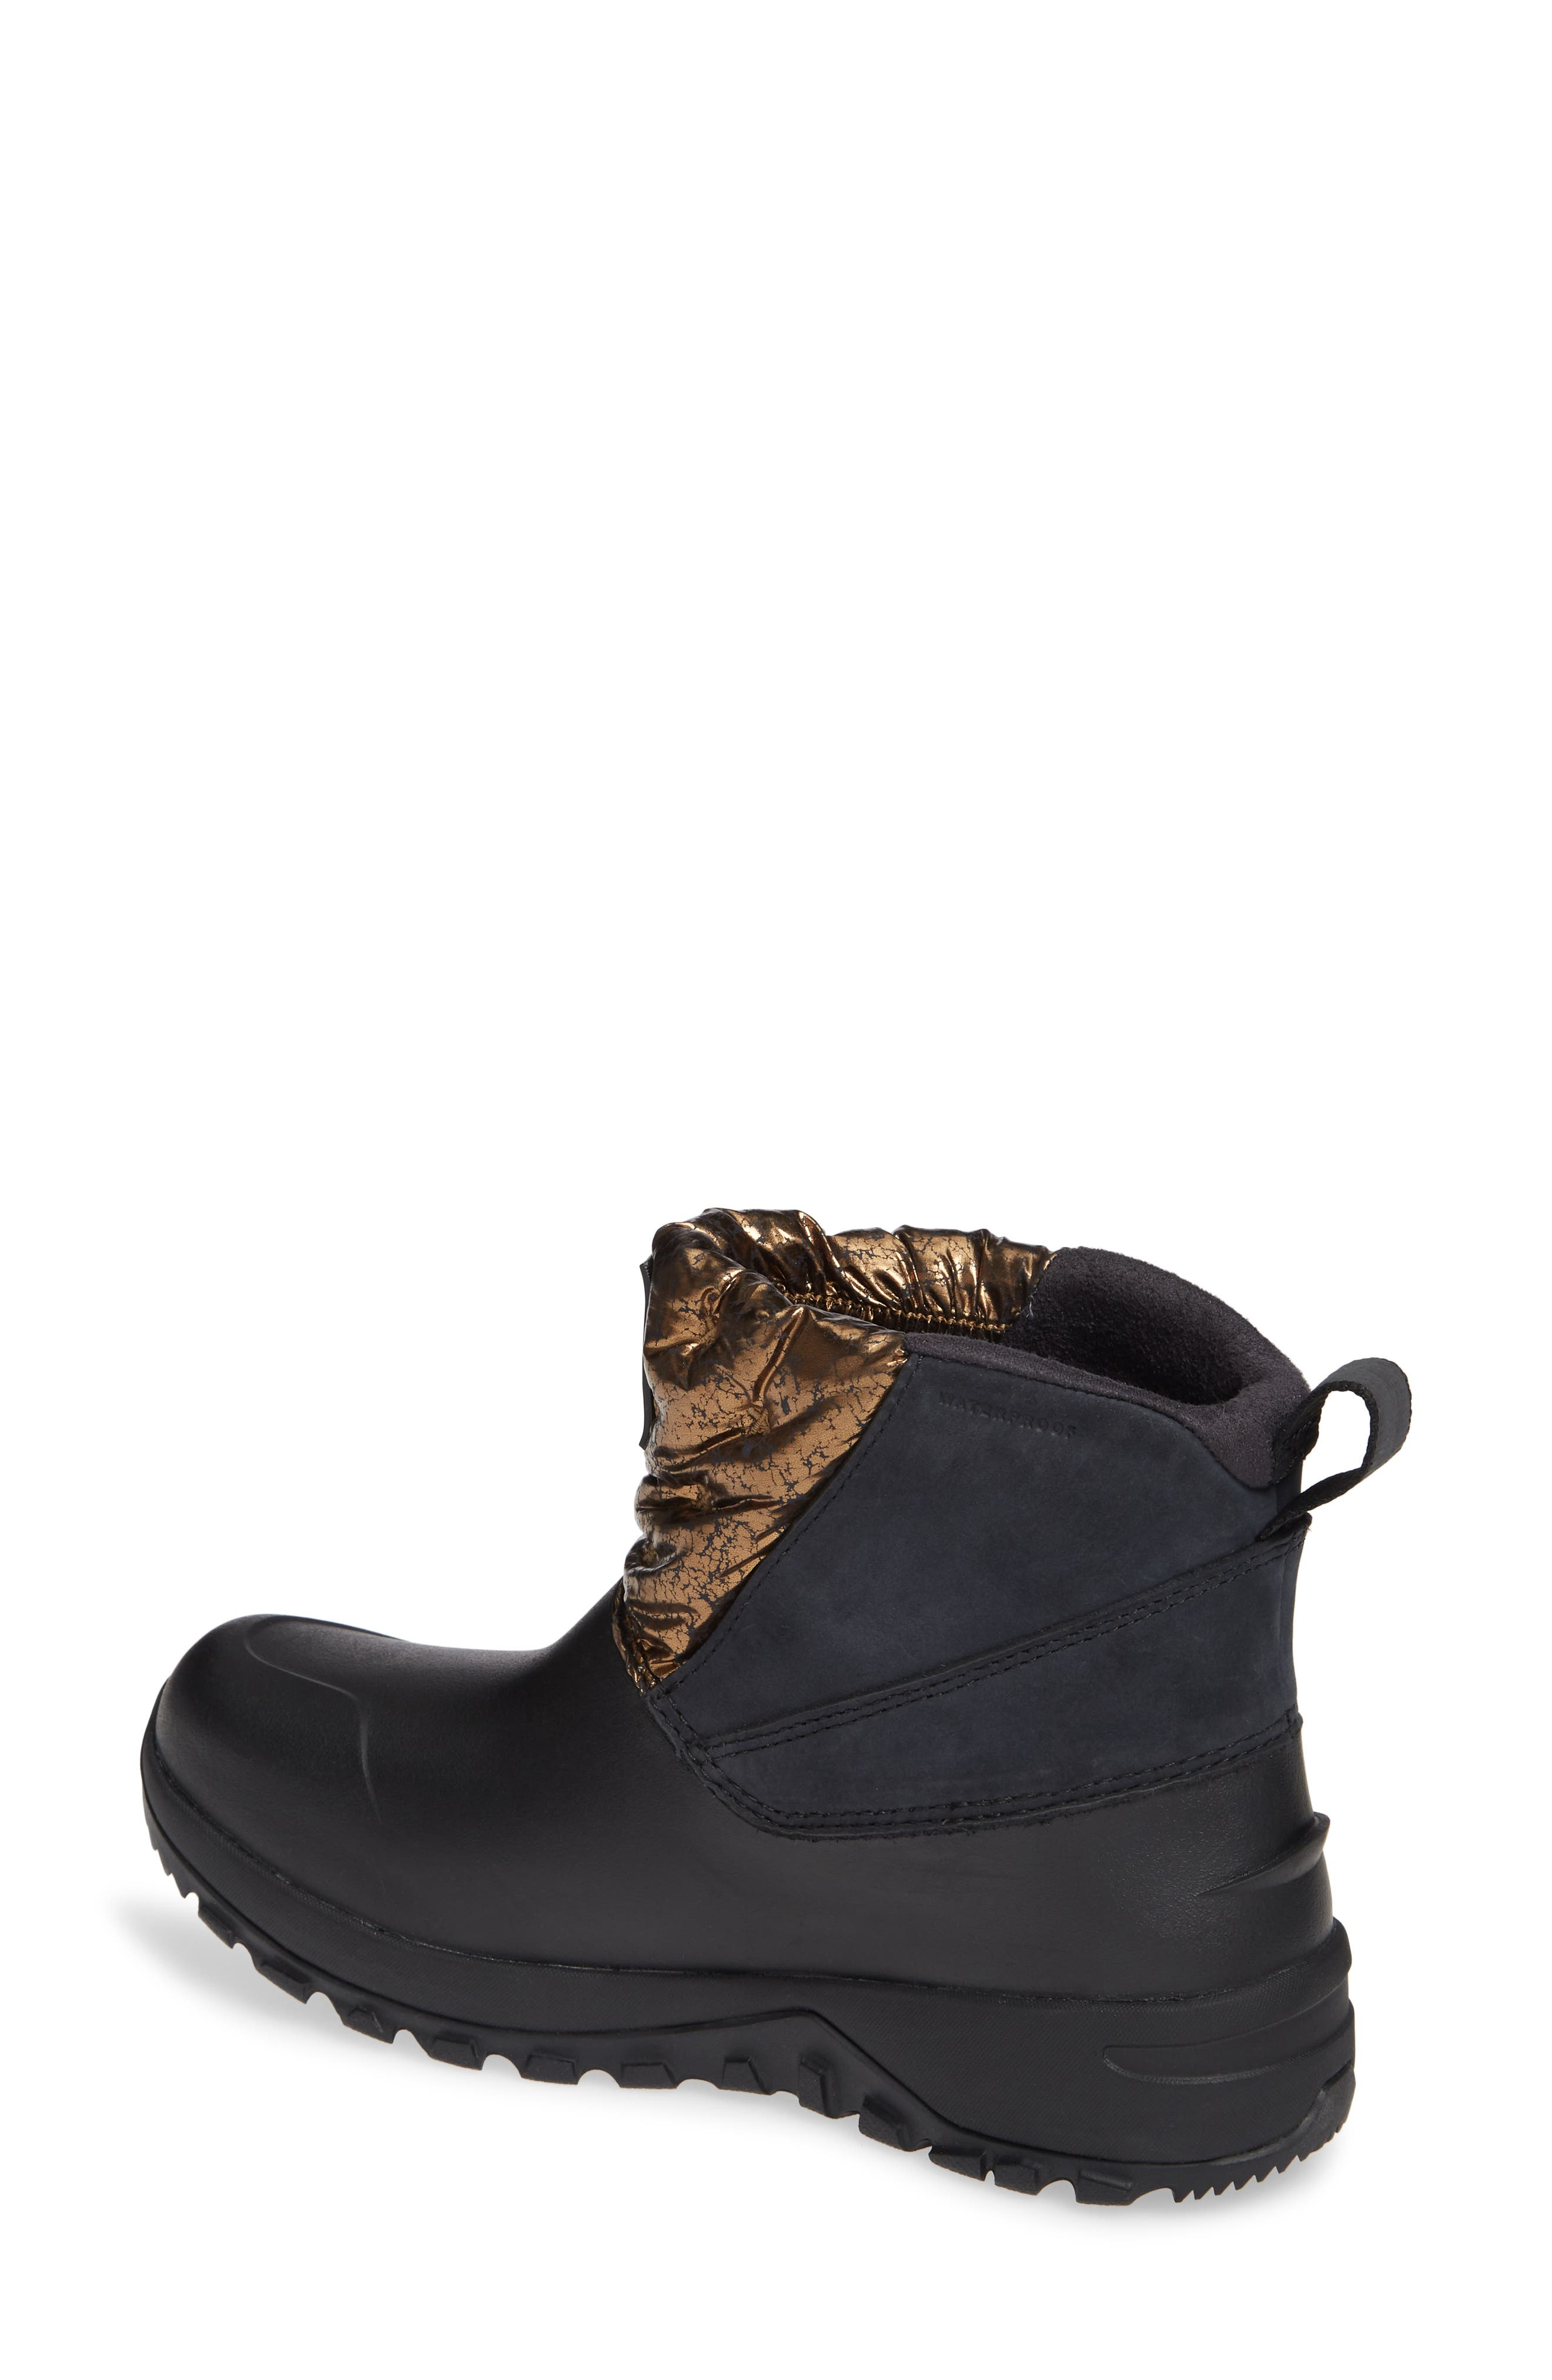 Yukiona Waterproof Ankle Boot,                             Alternate thumbnail 2, color,                             BLACK/ METALLIC COPPER